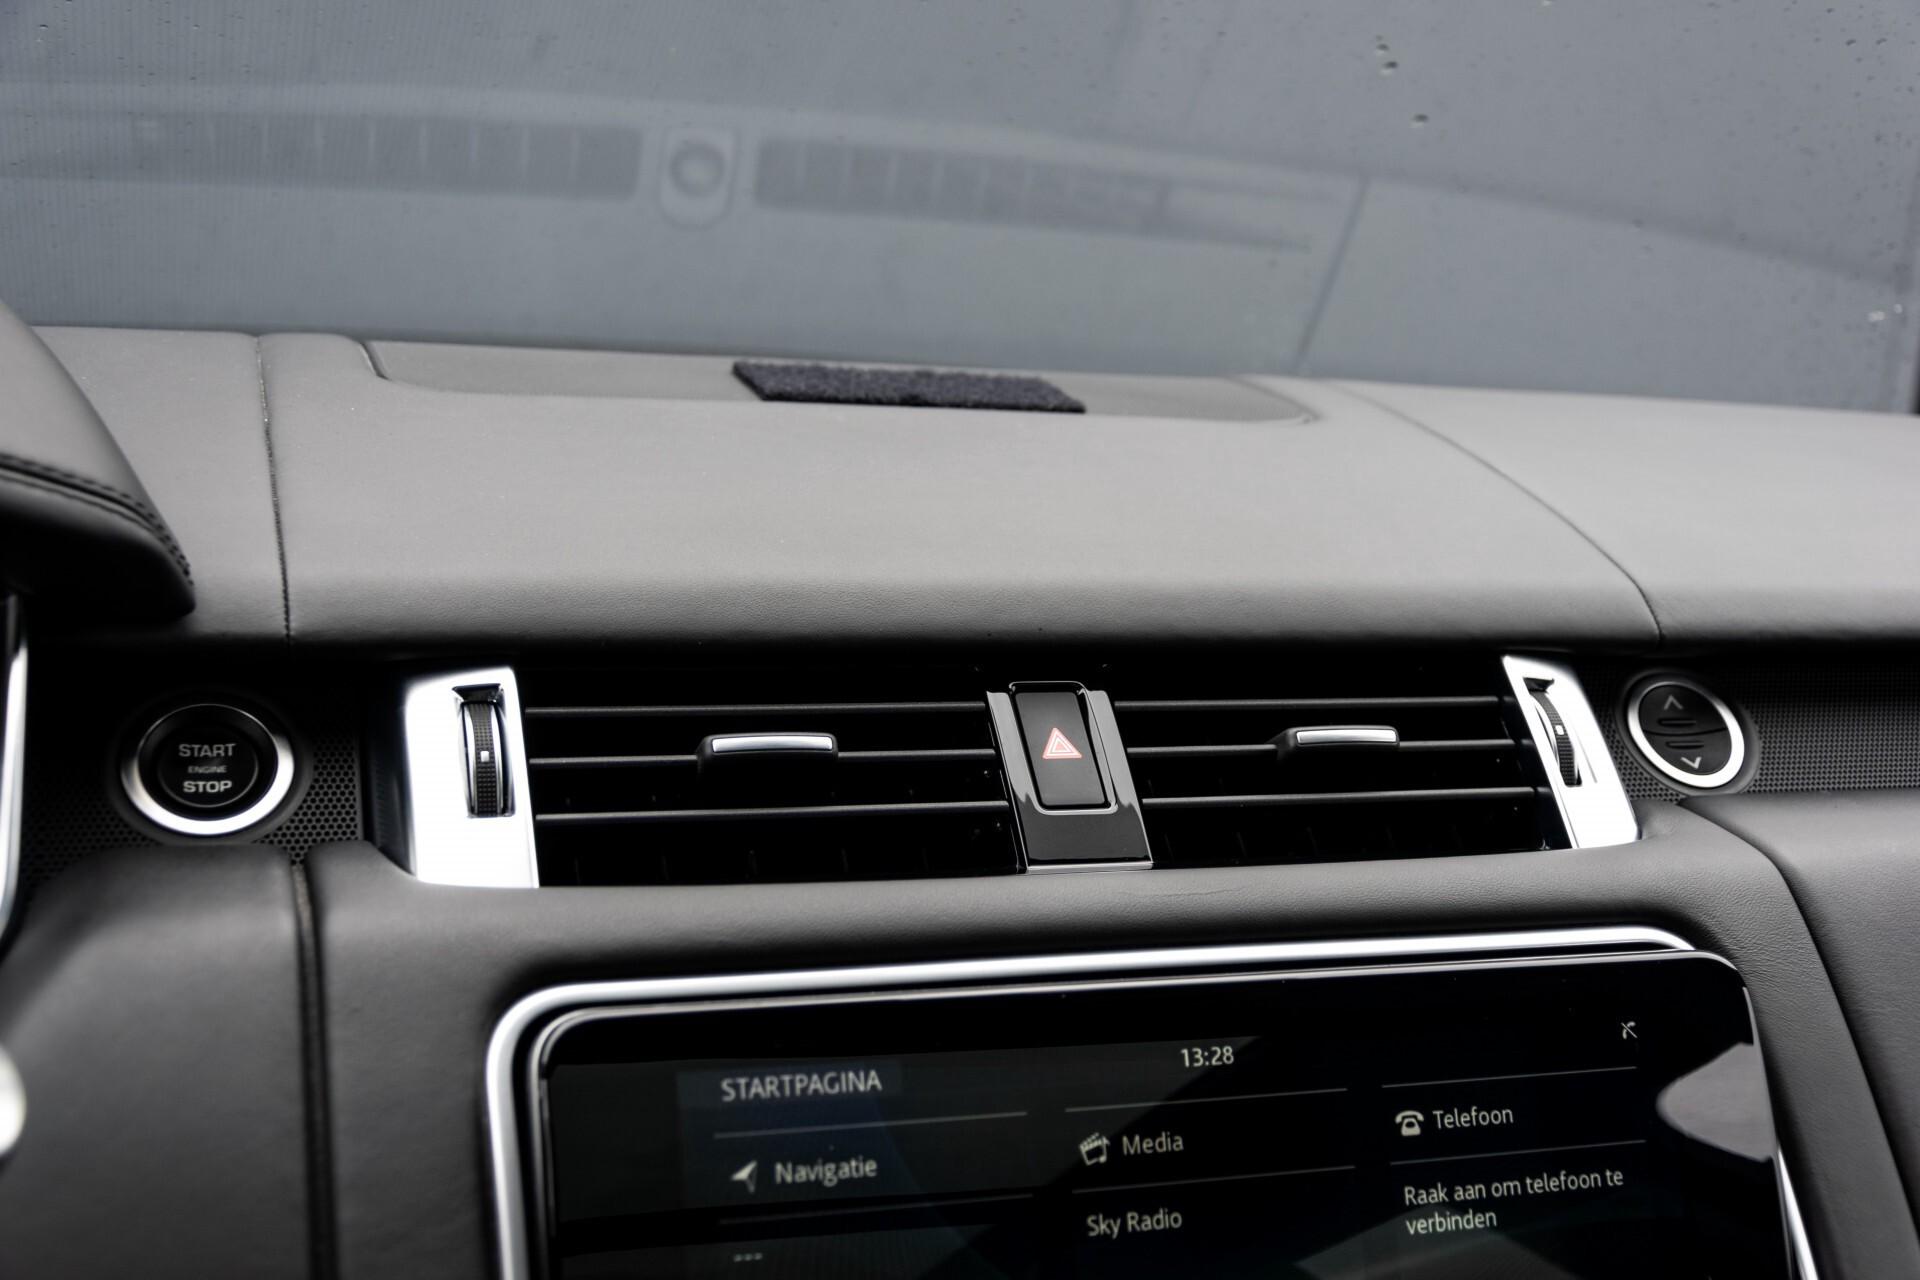 Land Rover Range Rover Sport SVR 5.0 Supercharged 575pk Full Carbon Nieuwprijs €241377 Foto 23